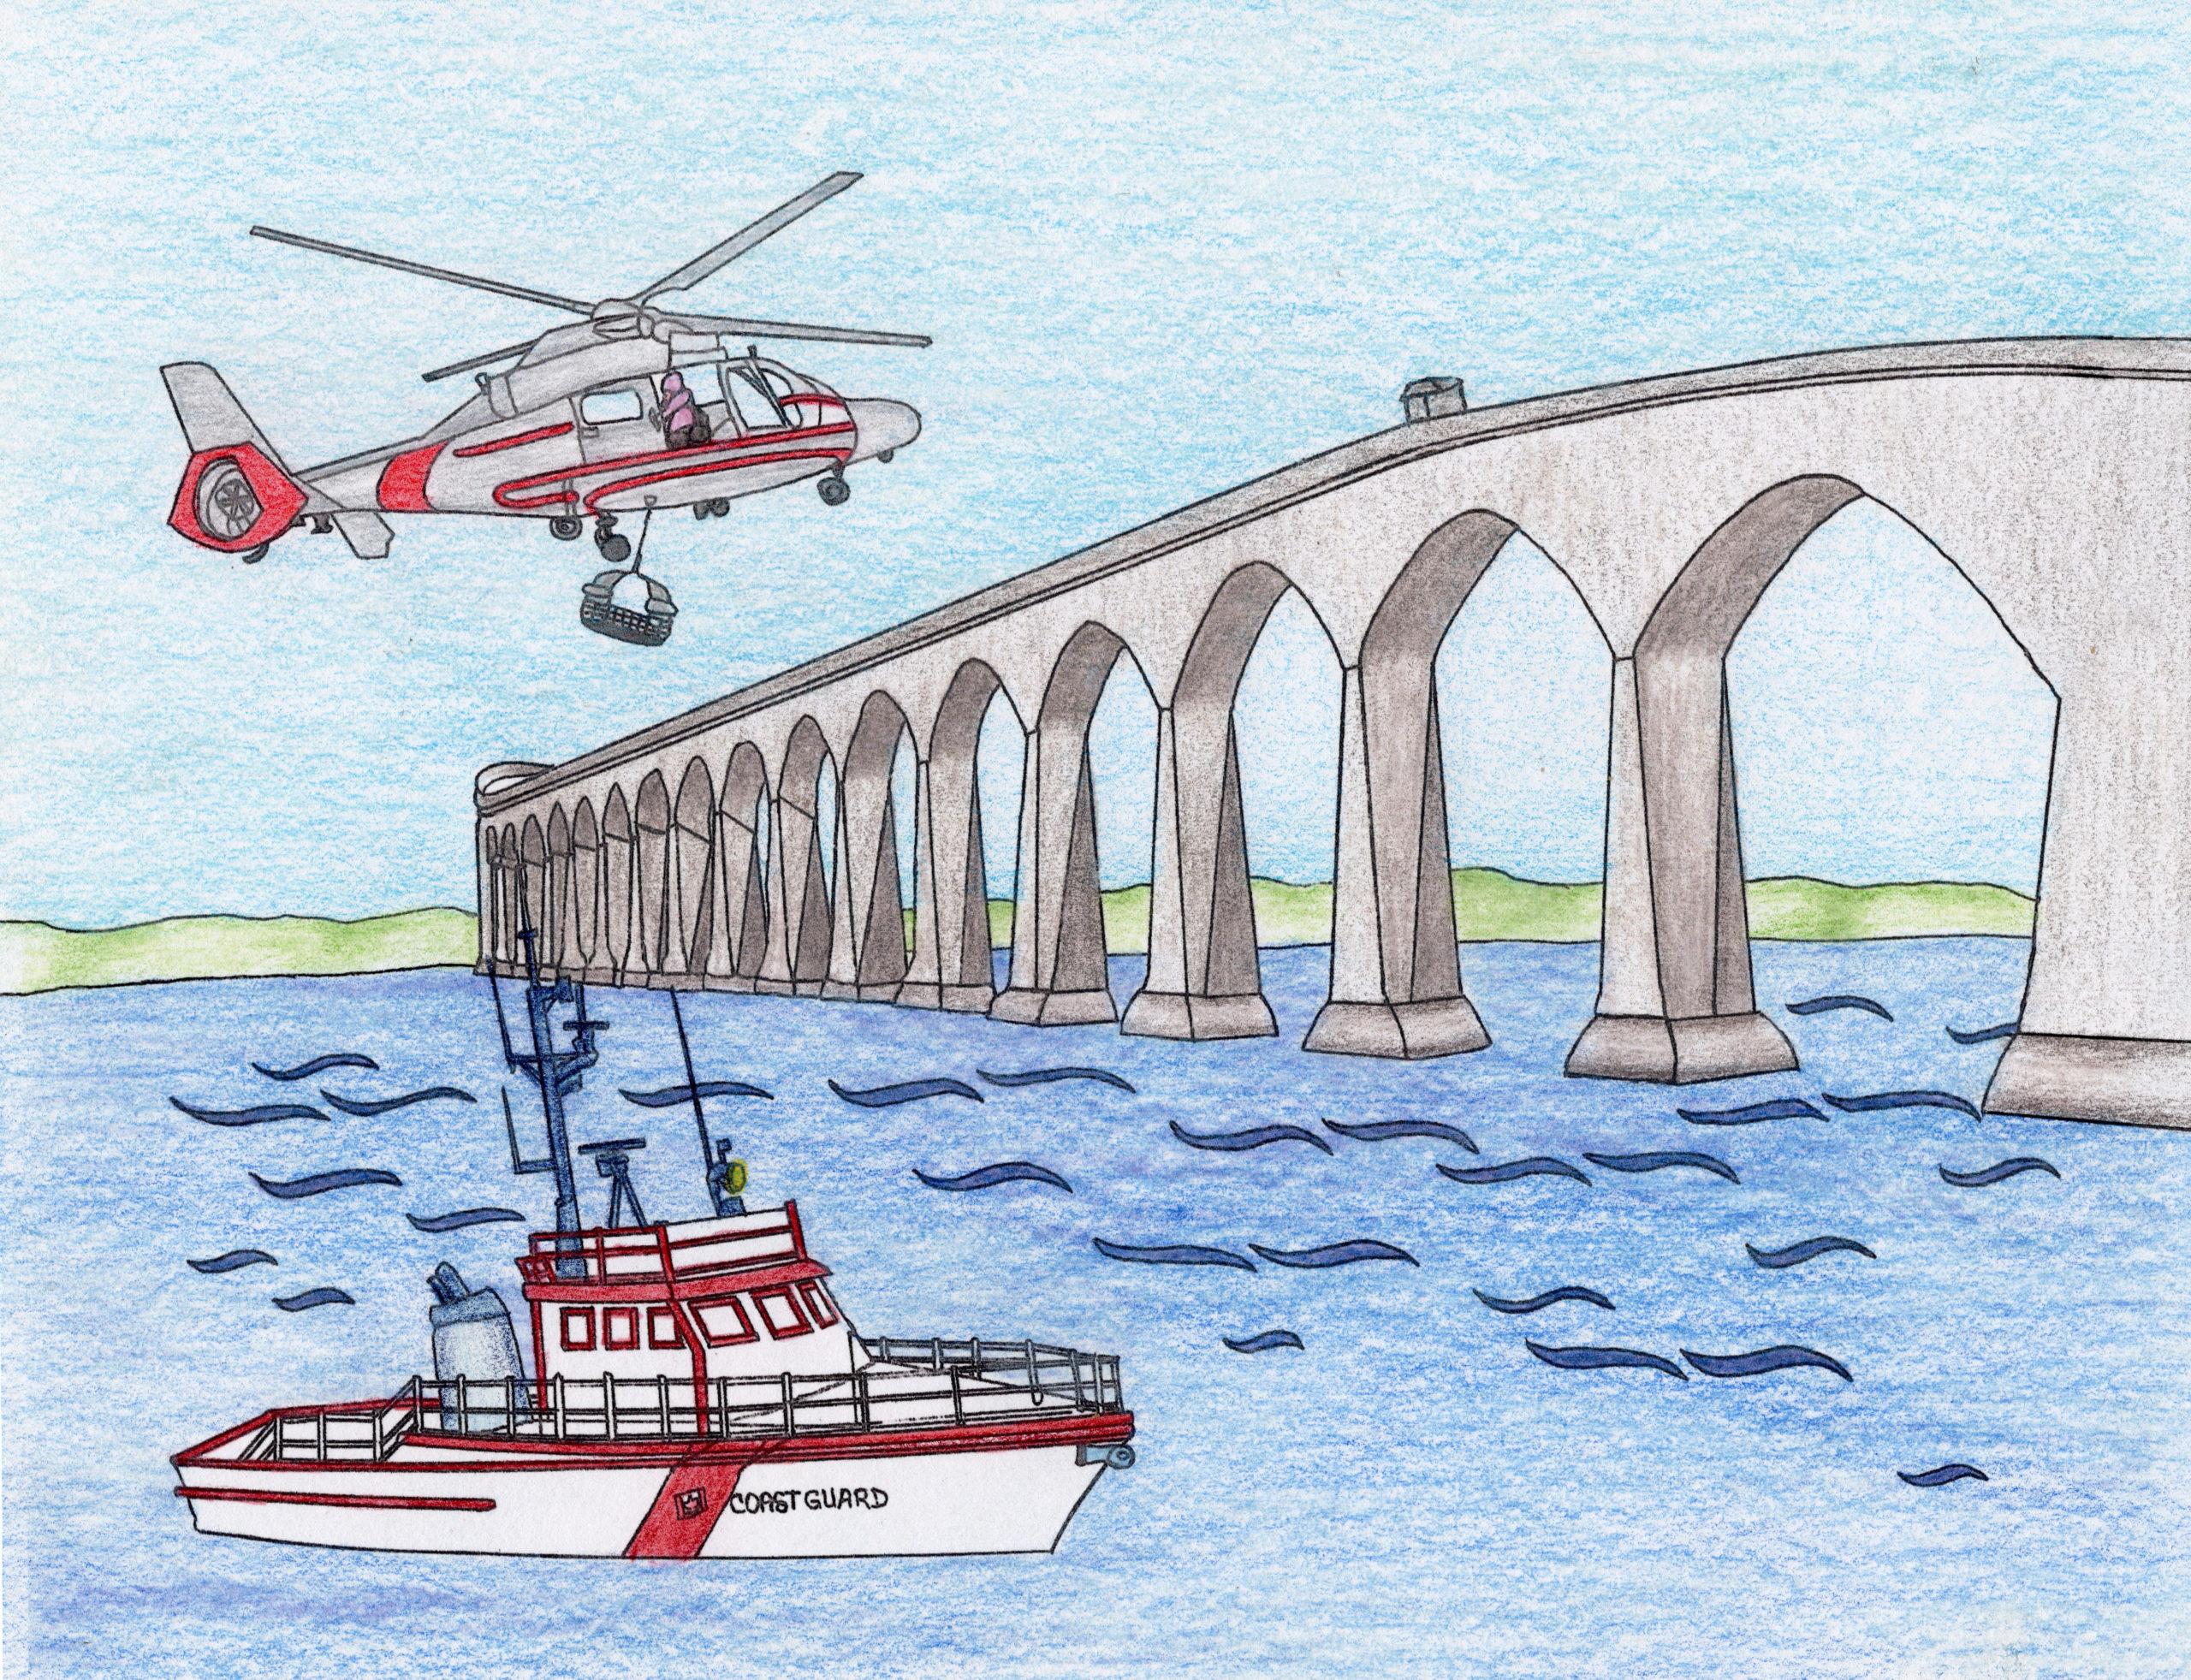 Atlantic Confederation Bridge